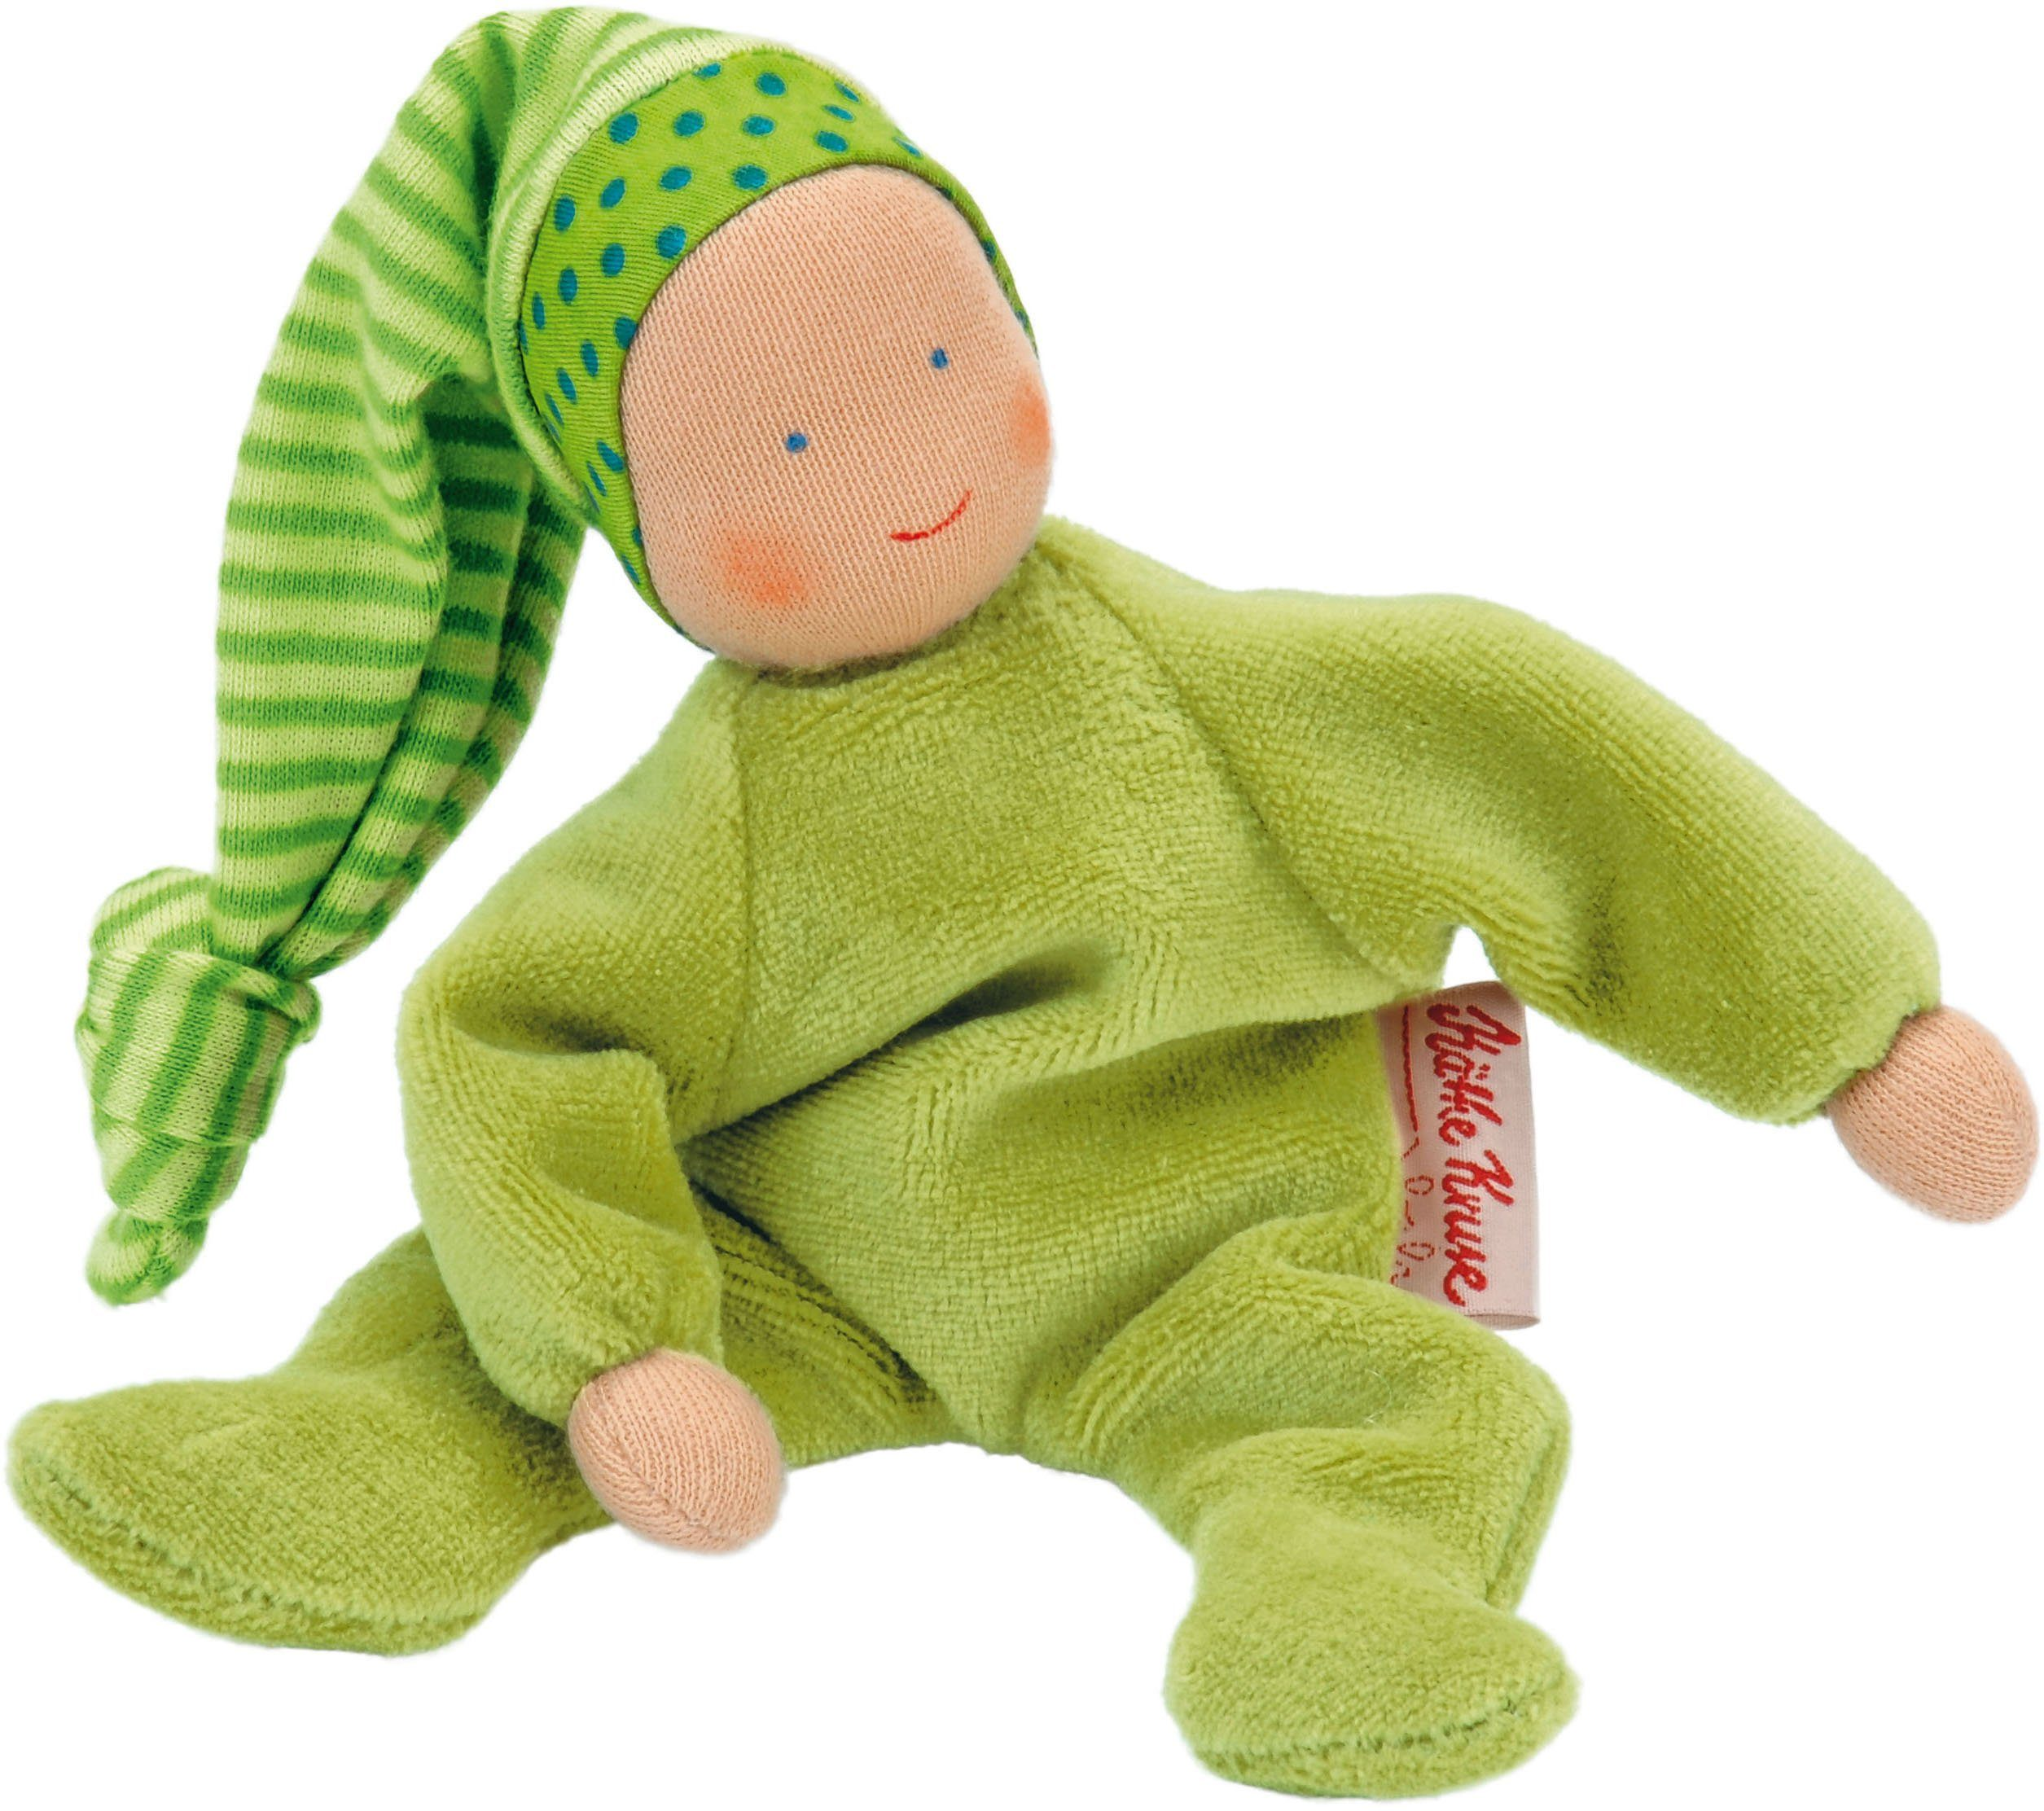 Käthe Kruse Stoffpuppe mit Zipfelmütze, »Nickibaby Grün«